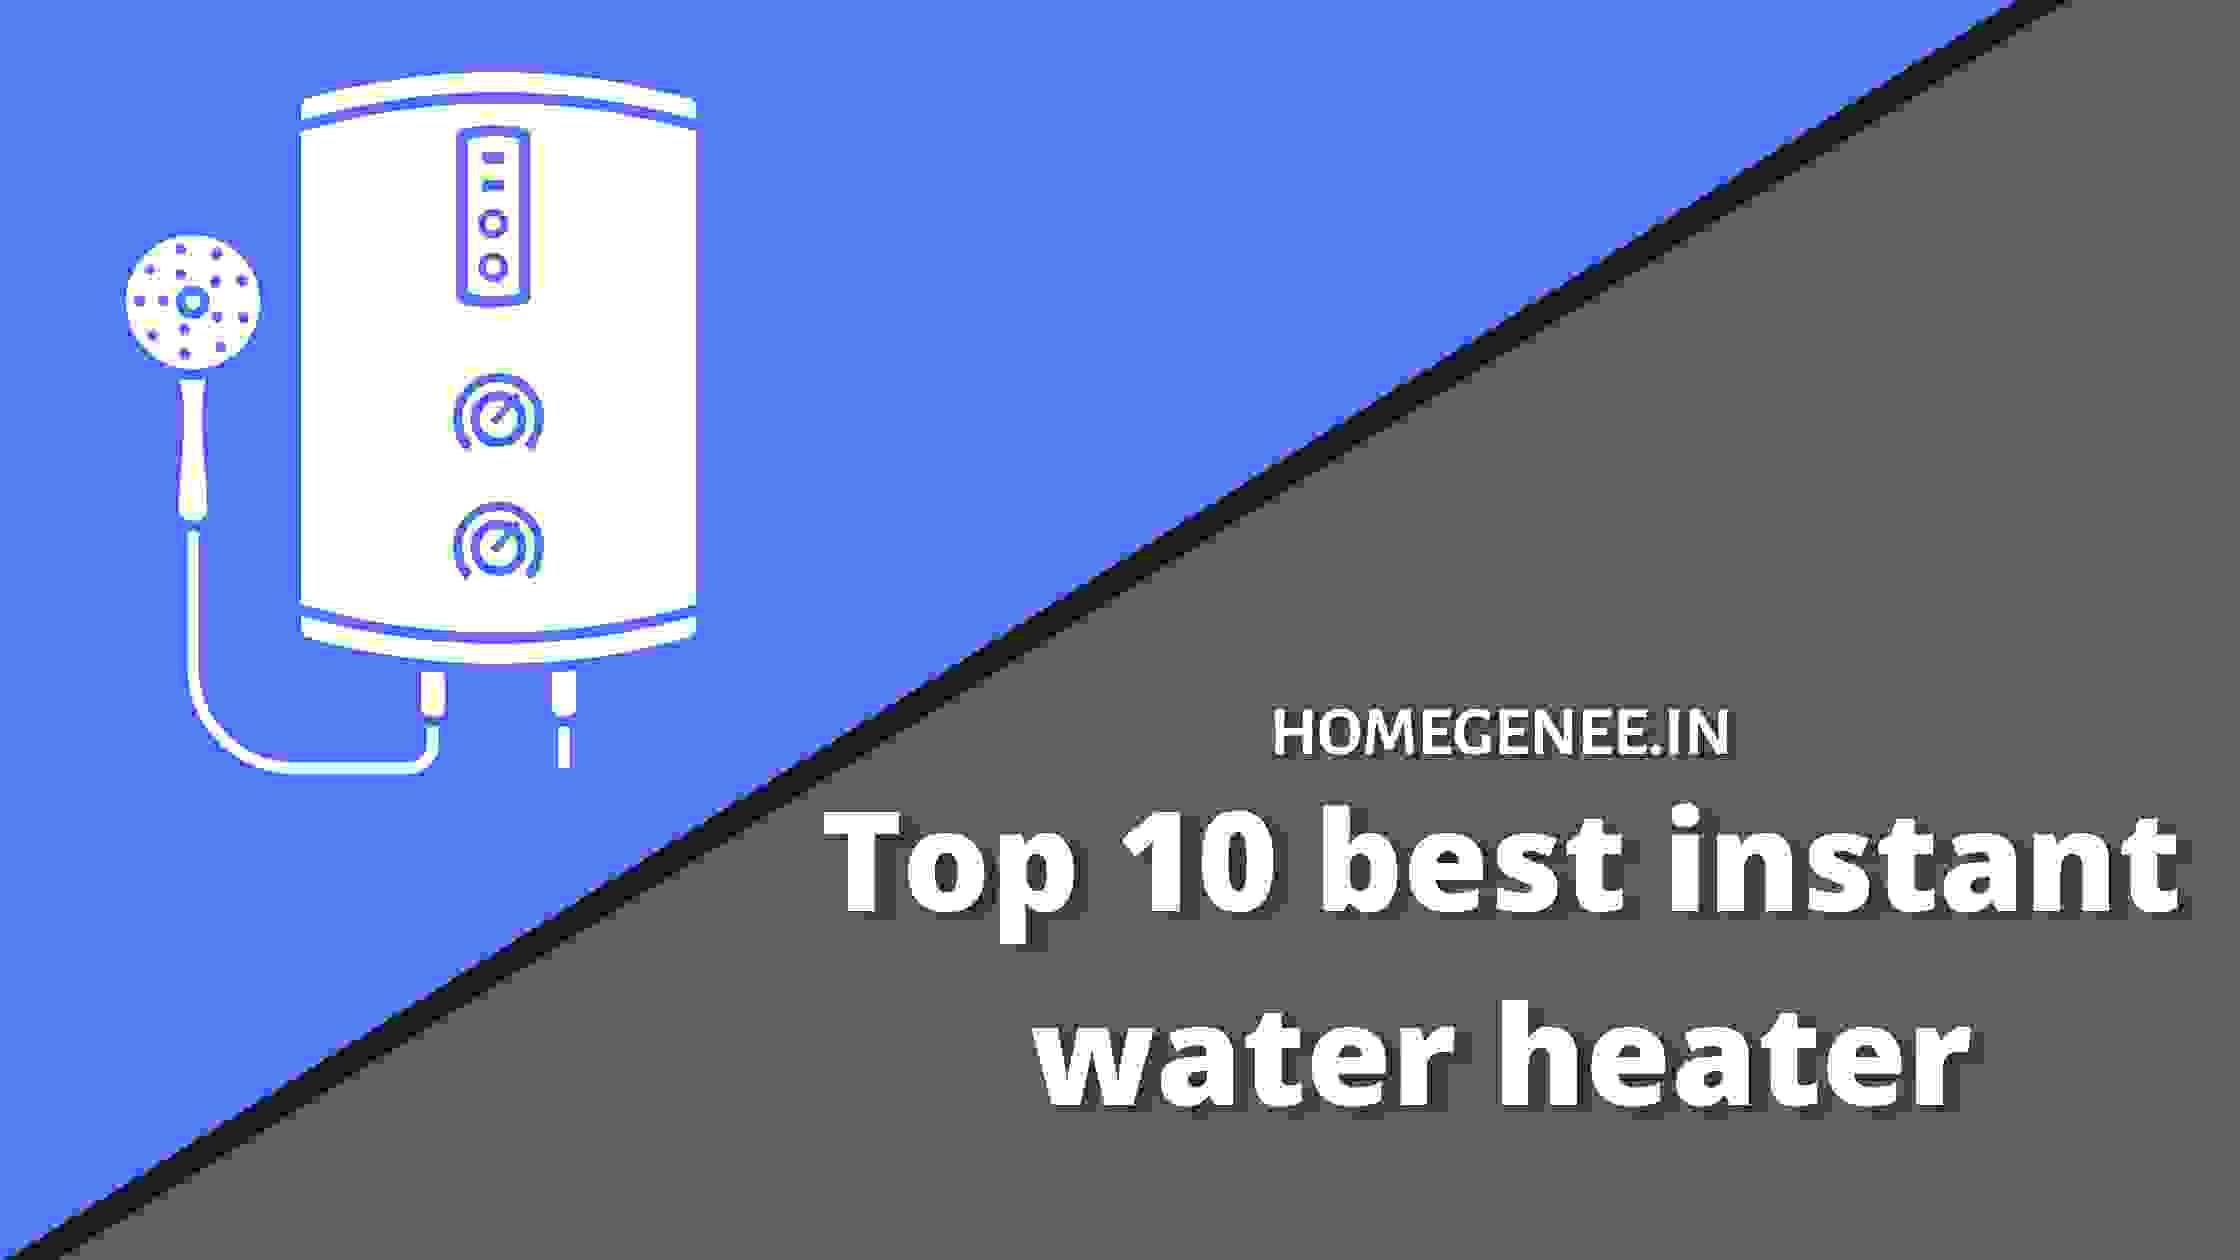 Top 10 best instant water heater in India